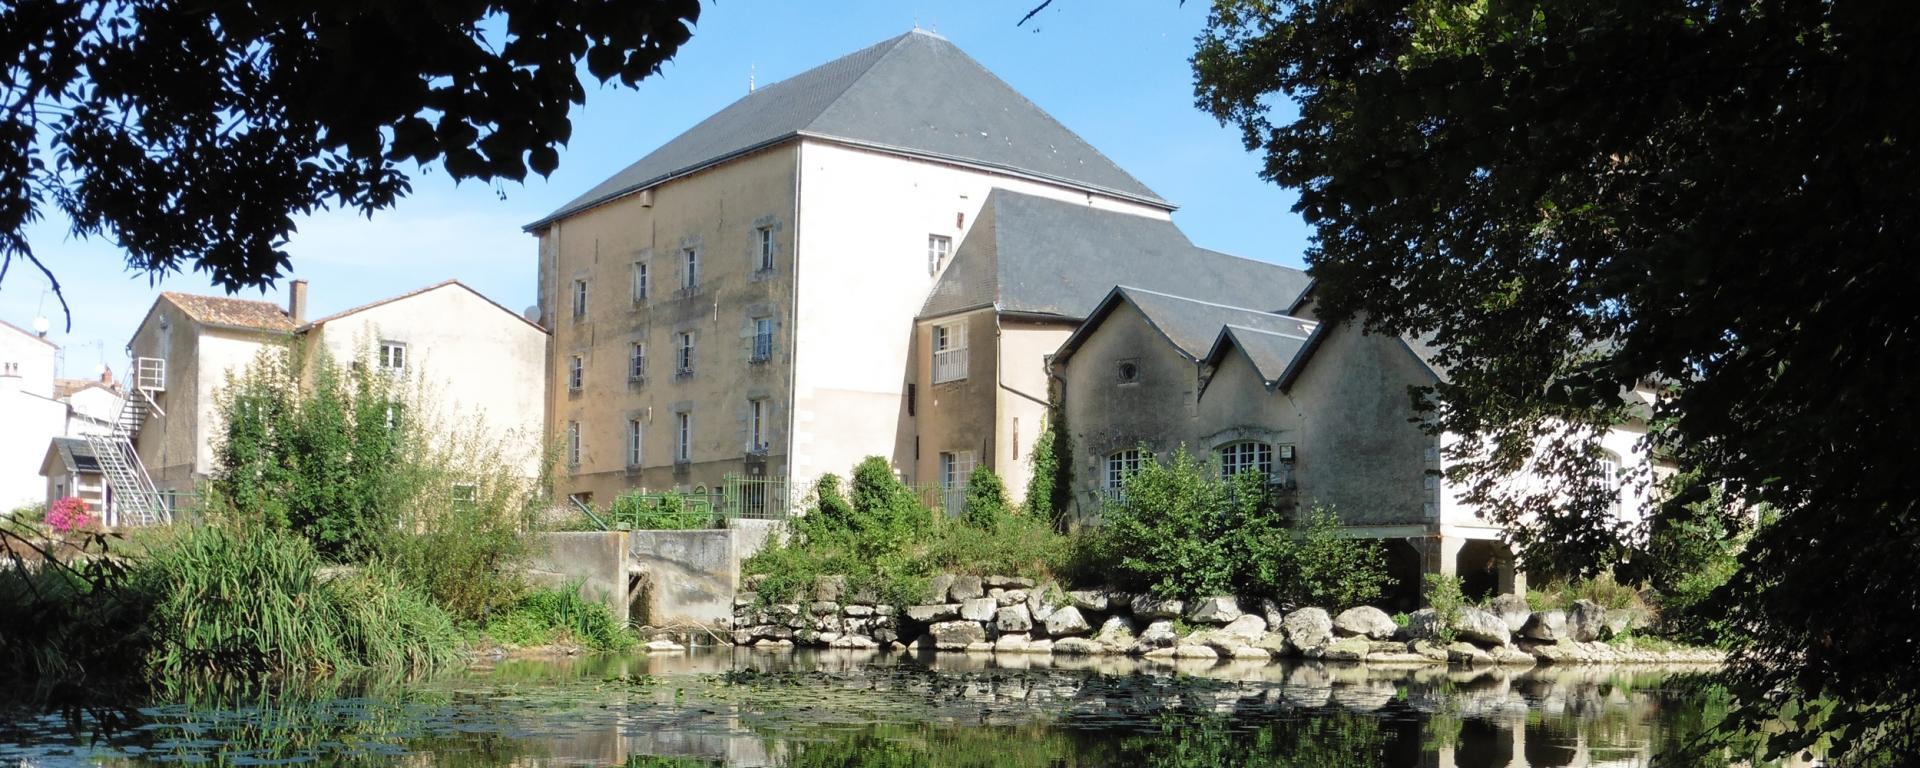 Moulin d'Anguitard - Chasseuneuil-du-Poitou [86]